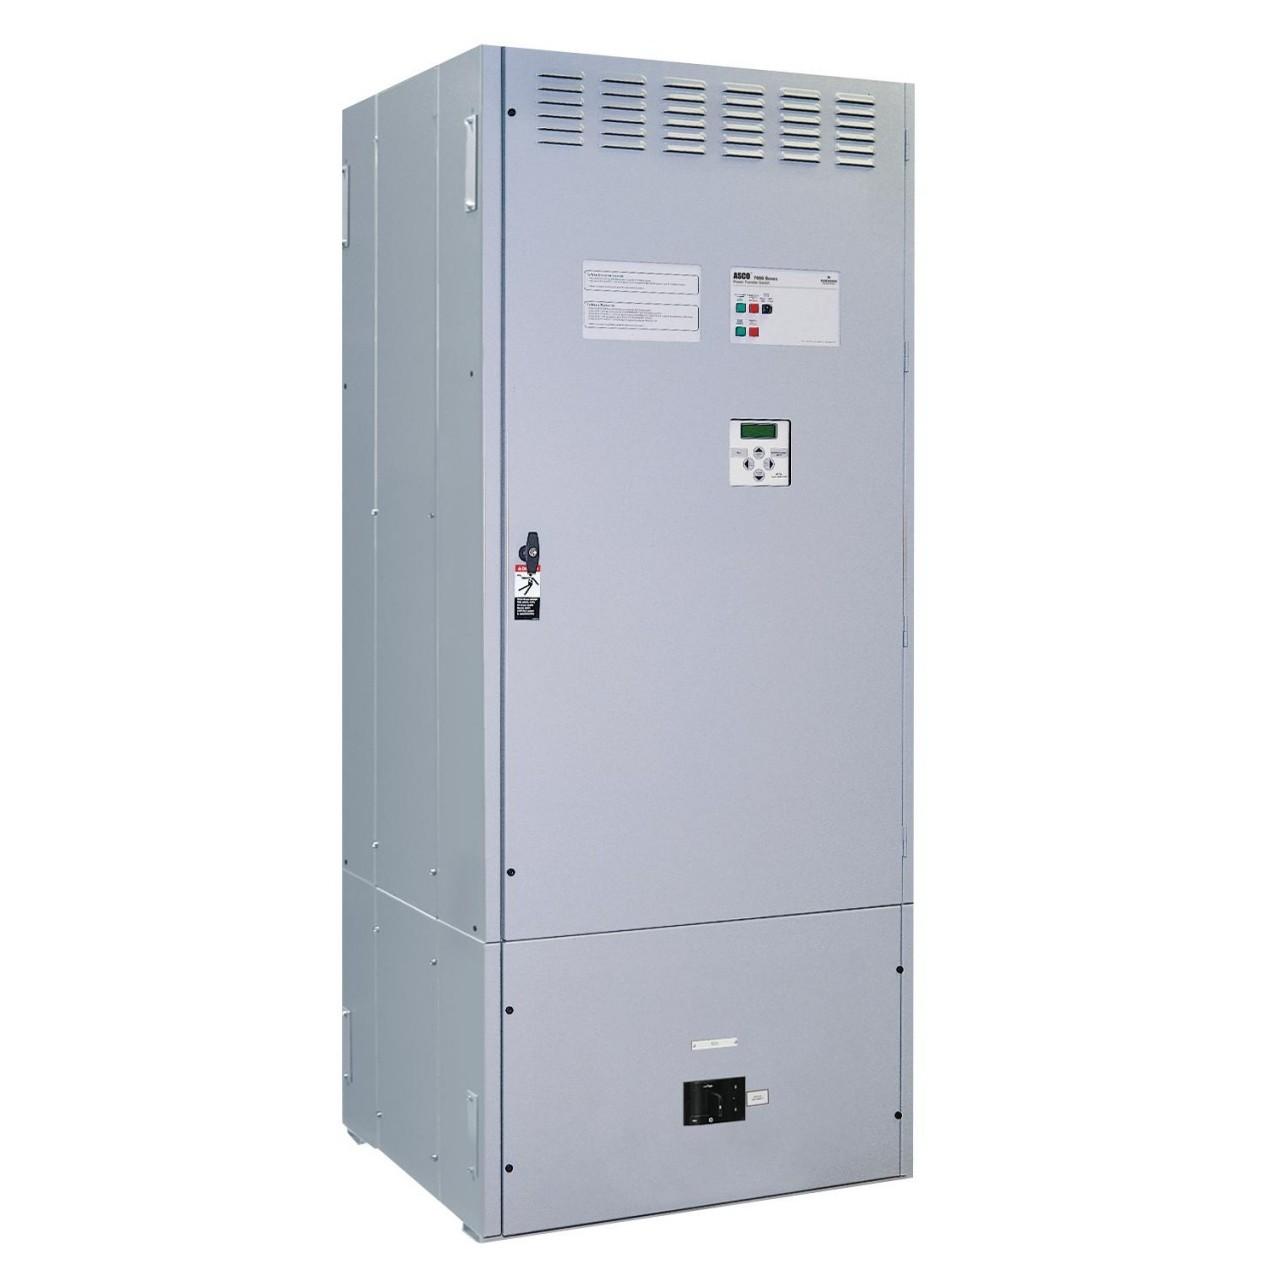 Asco 7000SE Auto Transfer Switch (1Ph, 400A)